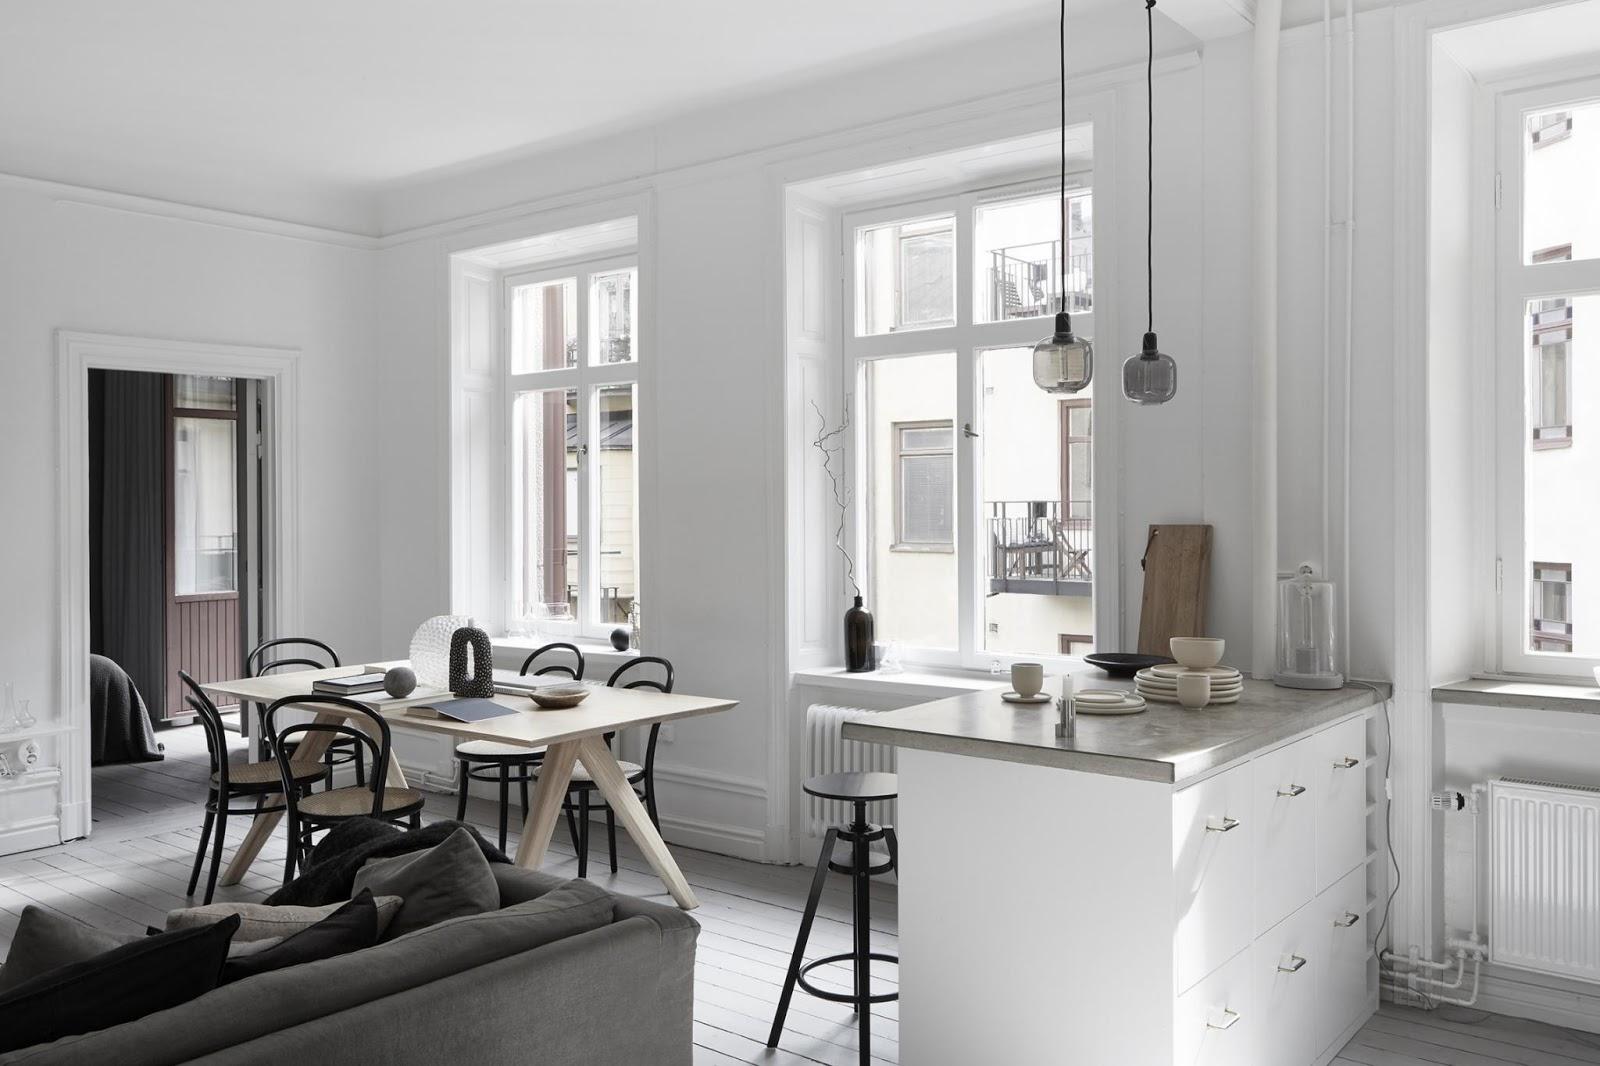 Appartamento a stoccolma shabby chic interiors